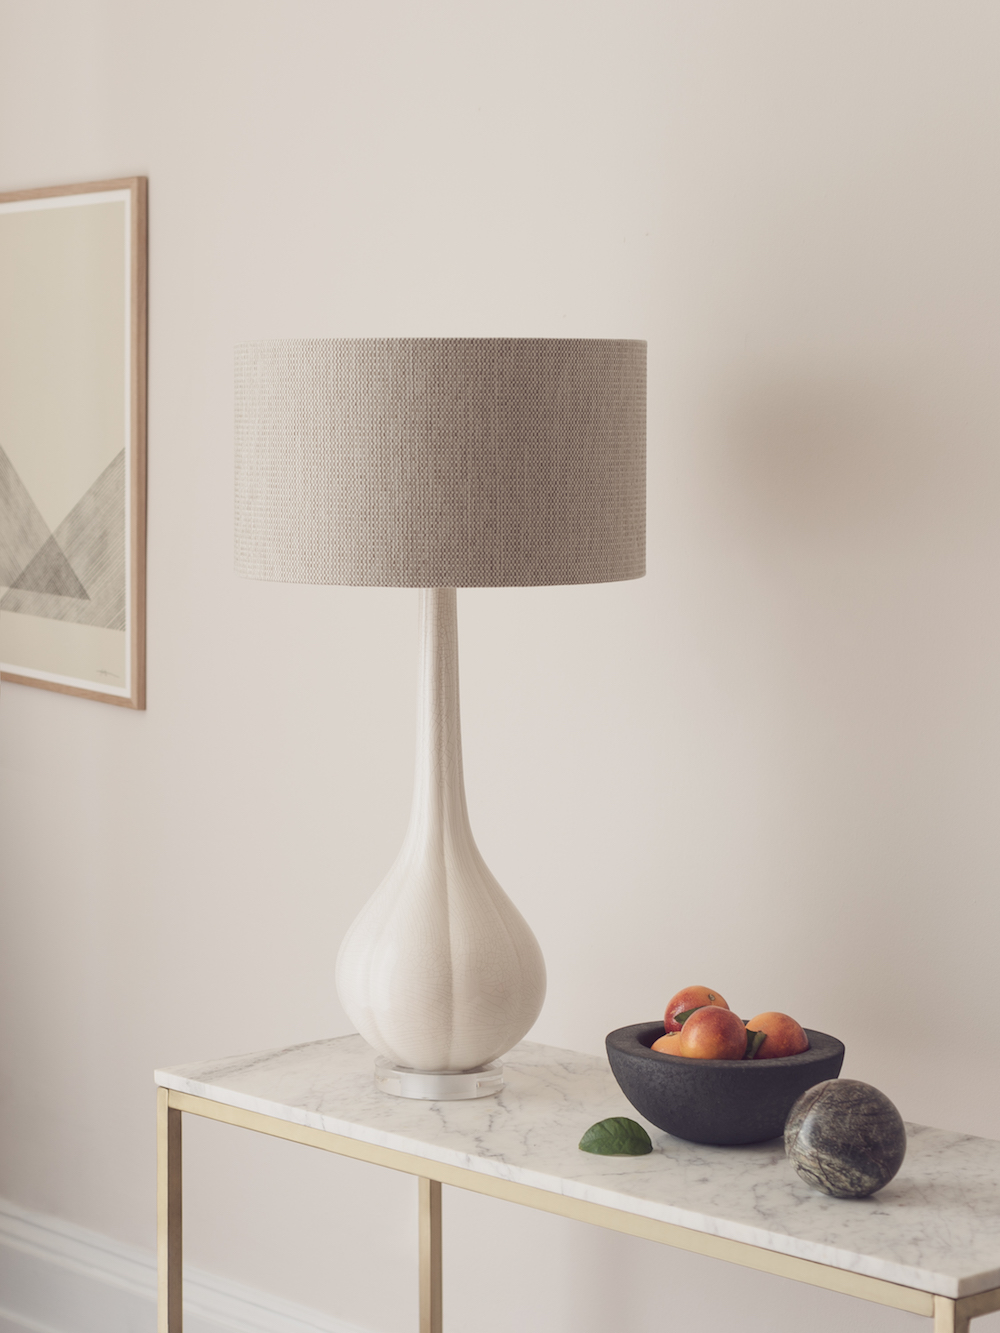 02. Heathfield & Co Elenor Table Lamp